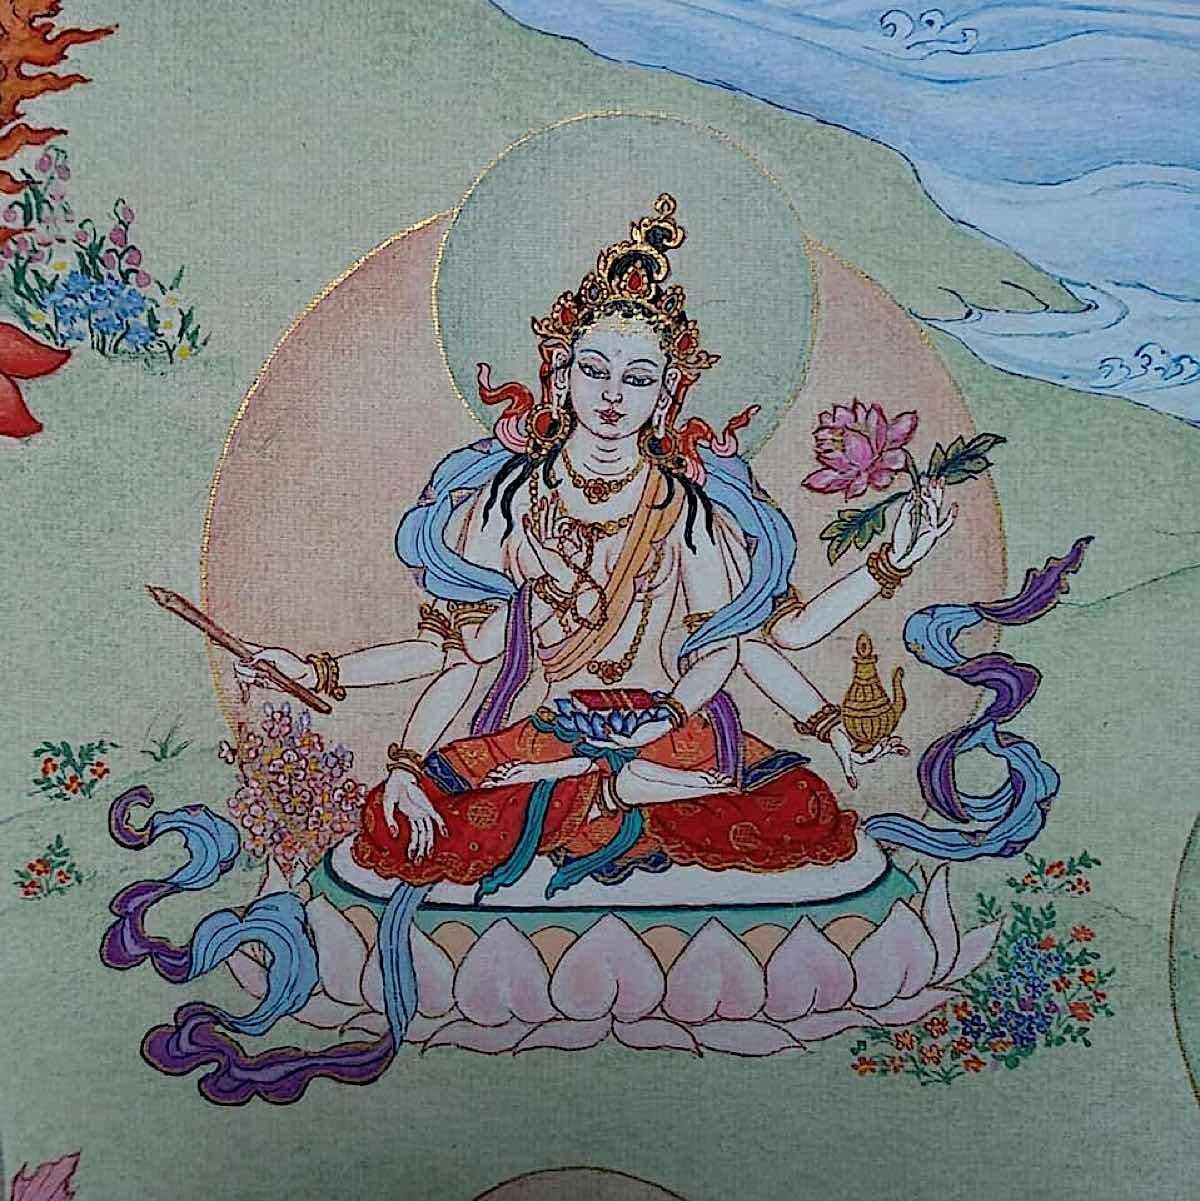 Buddha Weekly 15 Tara the Great Peaceful One Maha Santi Tara 21 Taras Thankha by Angeli Lhadripa Shkonda Buddhism